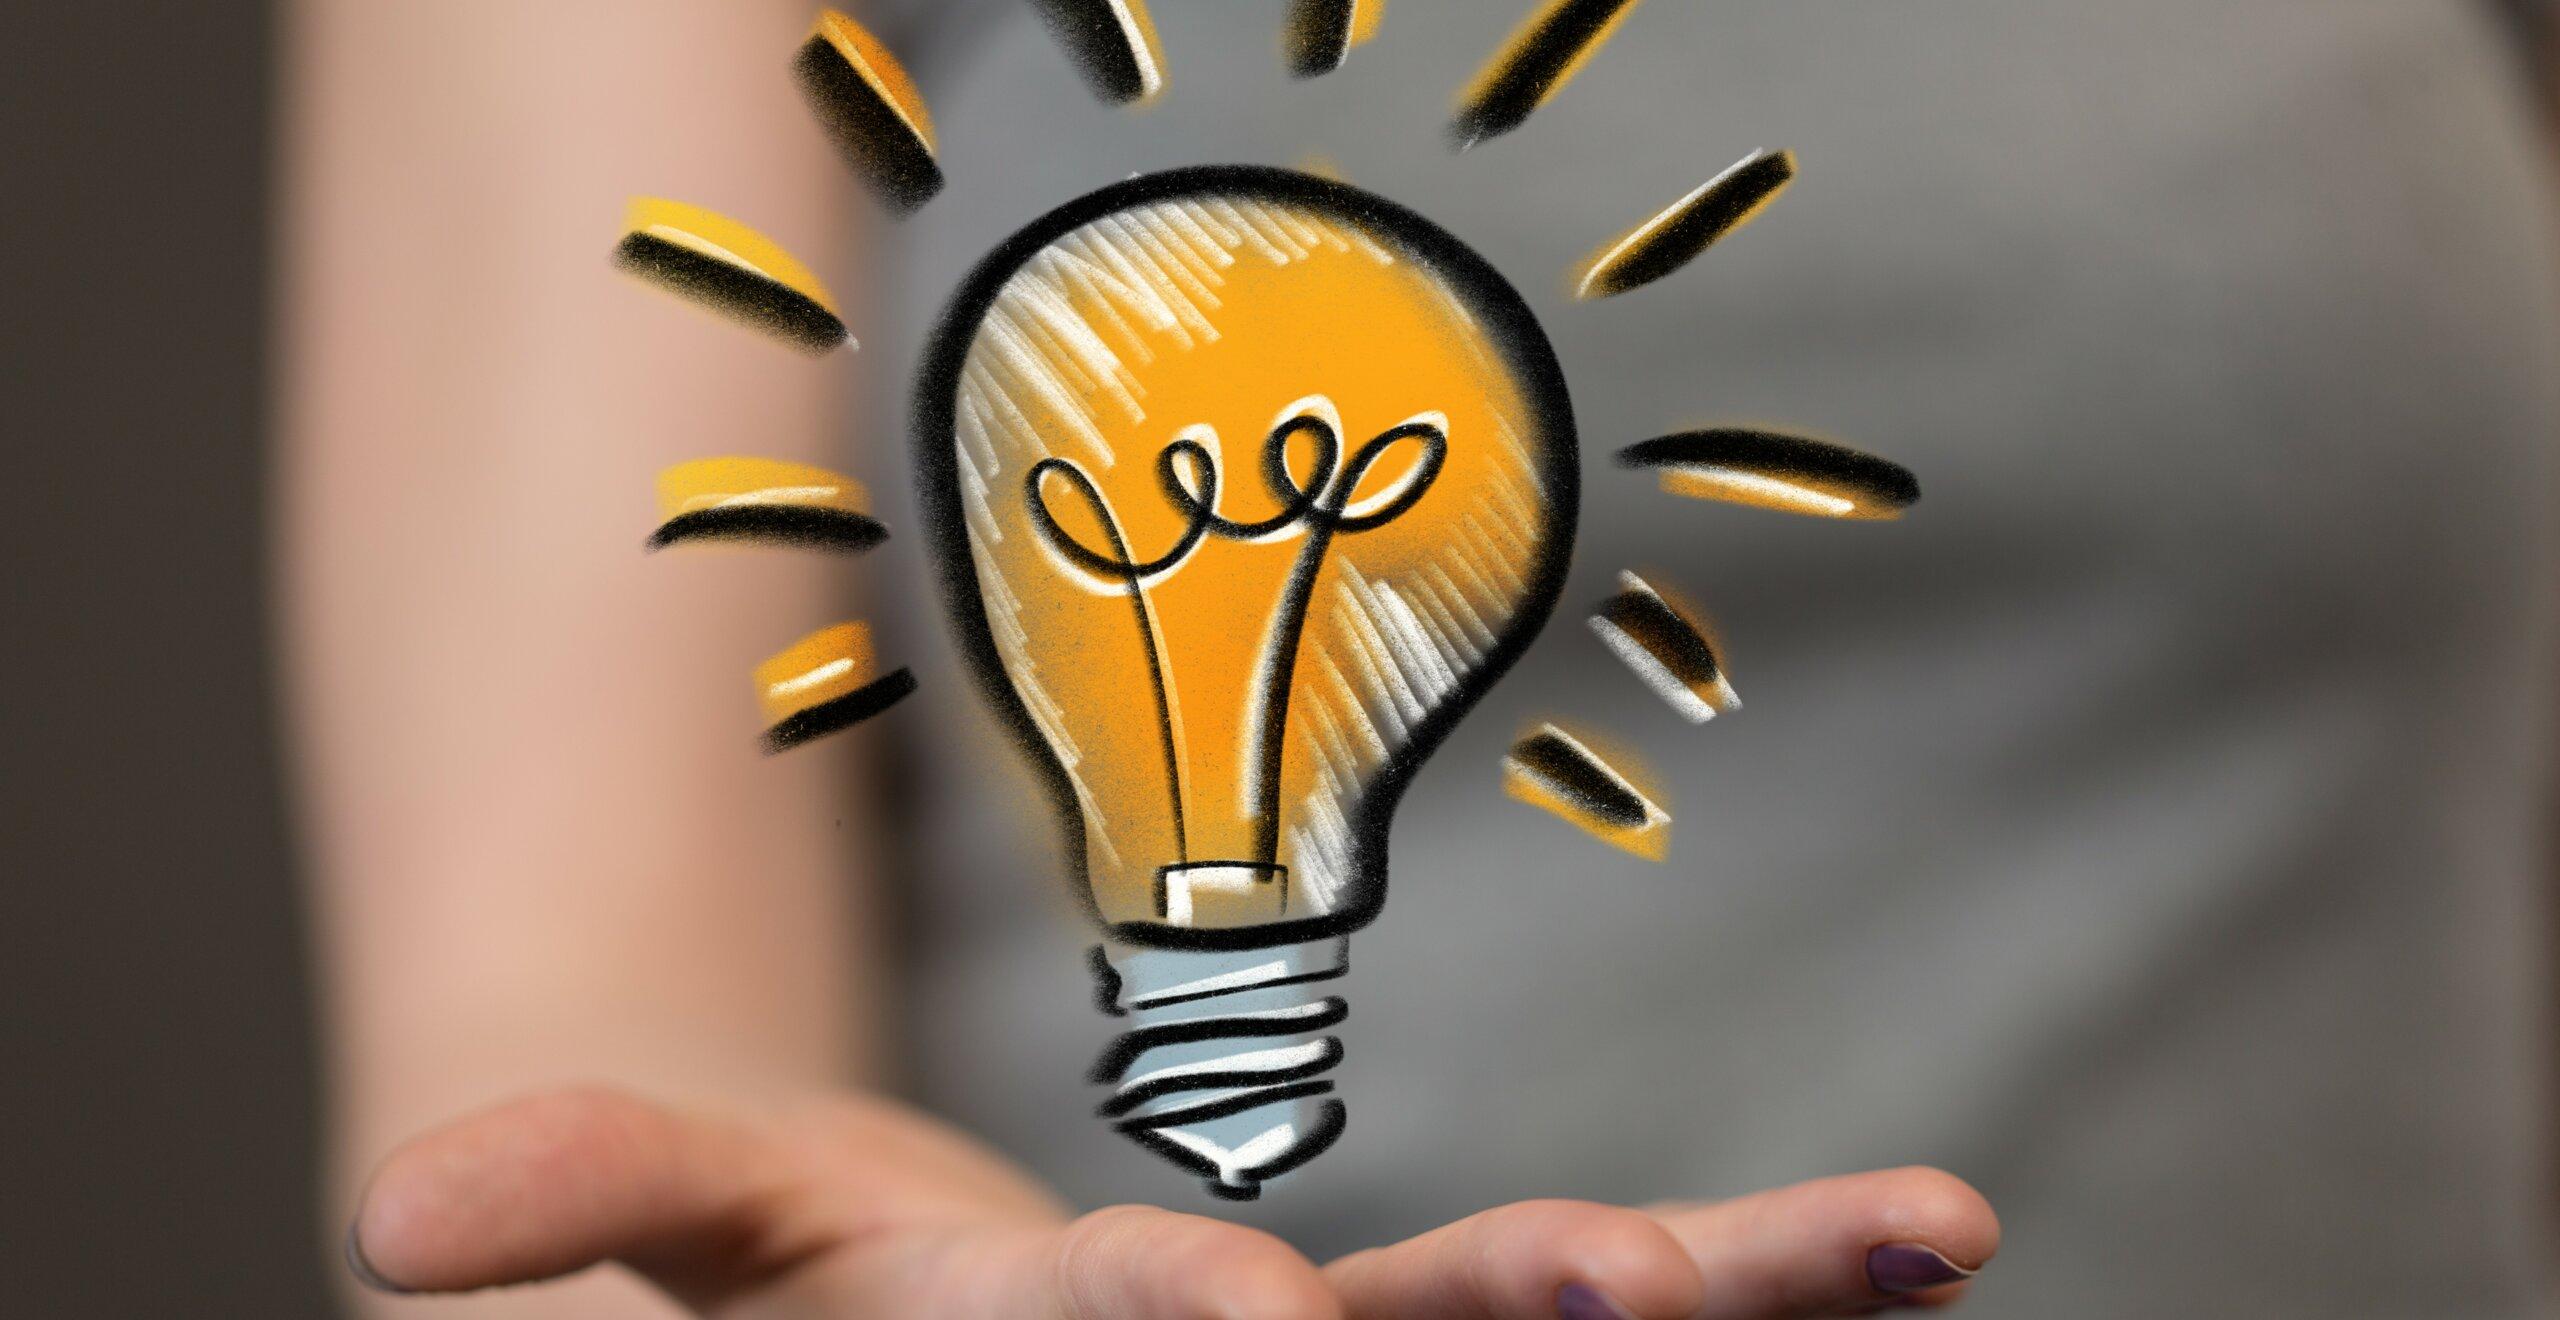 Etudiant-entrepreneur Grenoble INP, lance-toi !